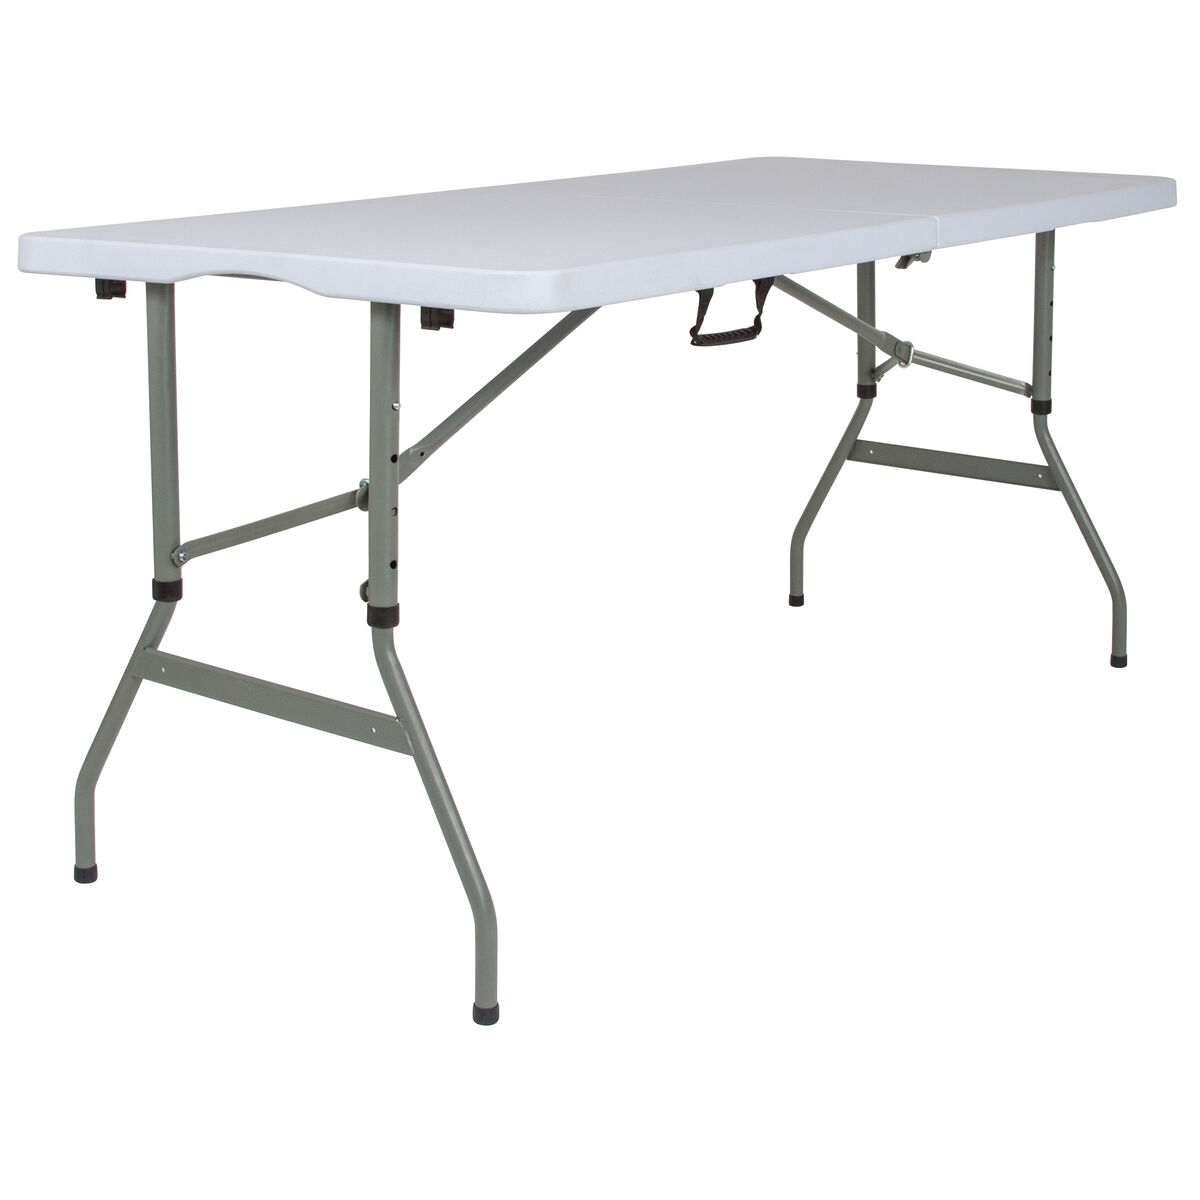 30x60 white bi fold table rb 3050fh adj gg bizchair com